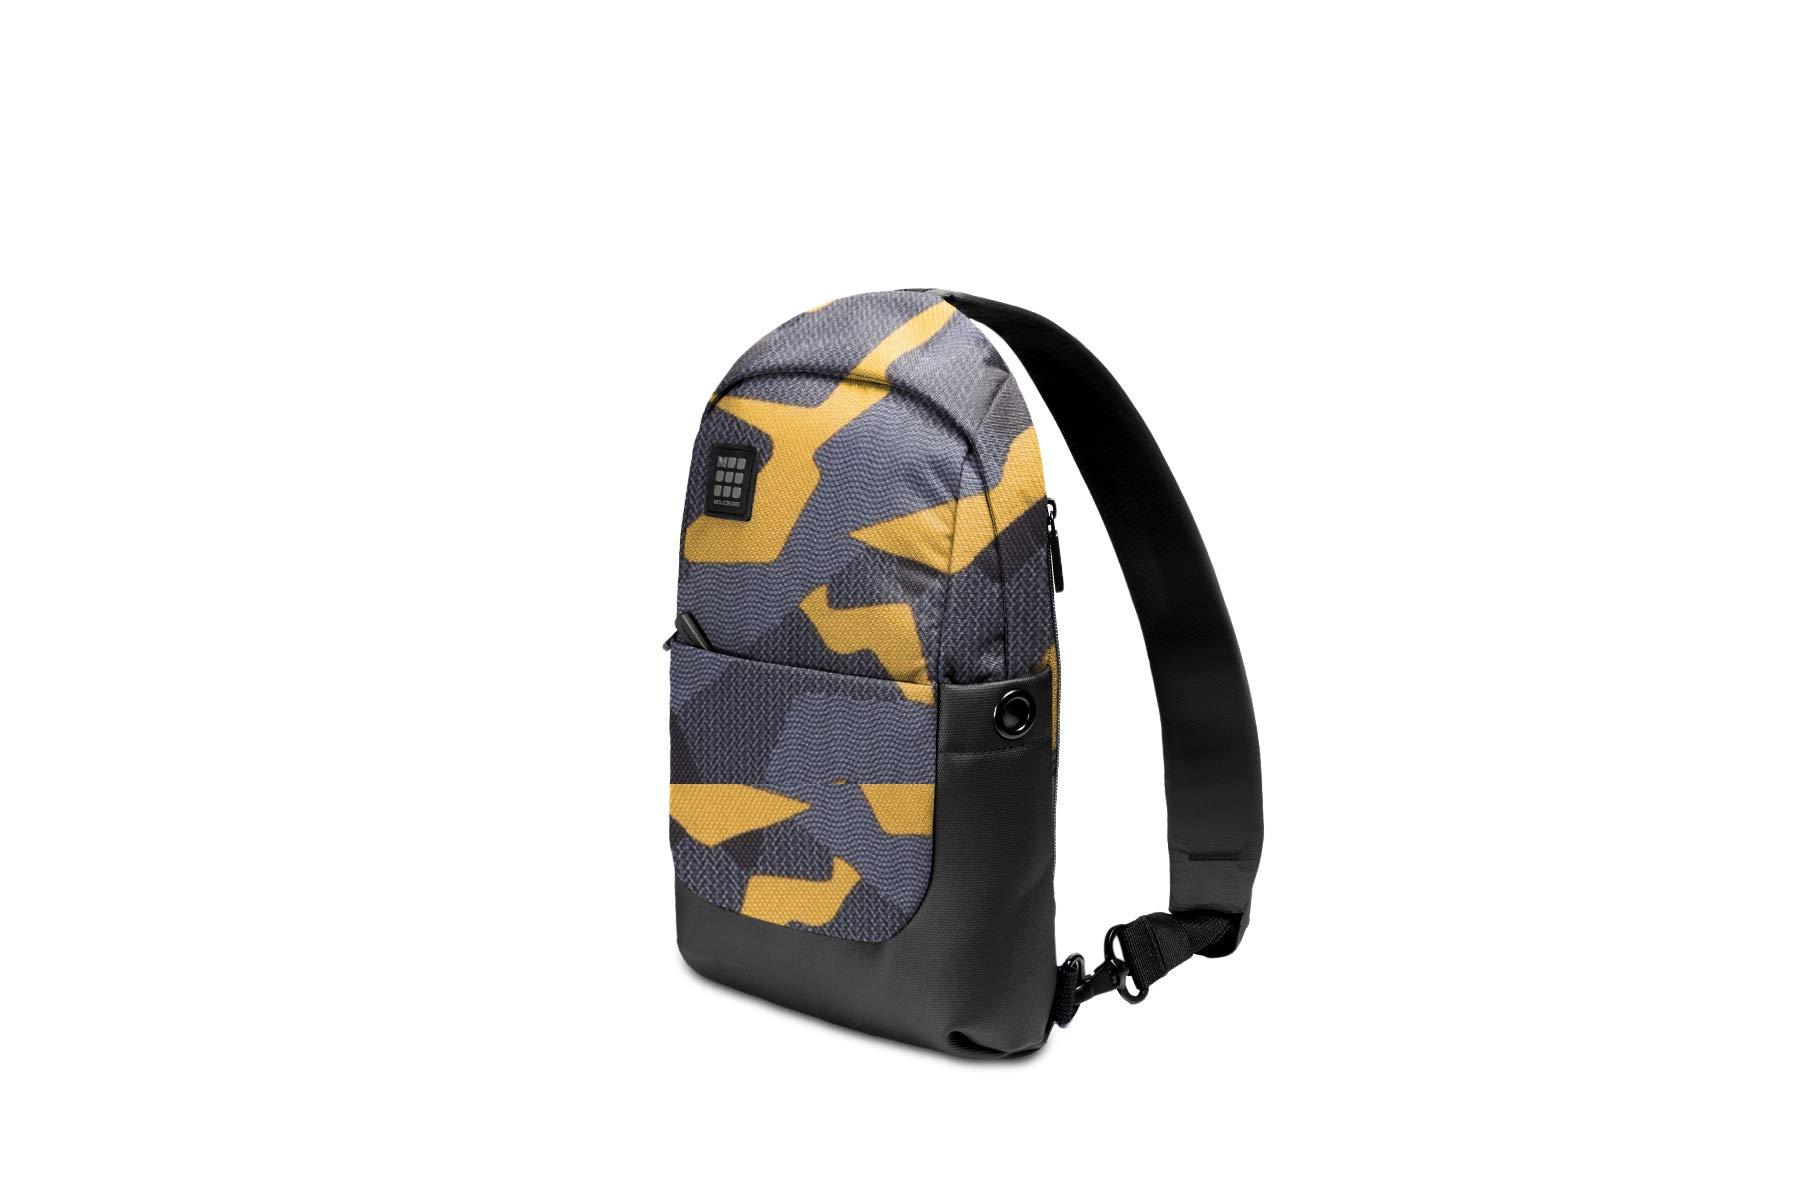 Moleskine ID Sling Backpack, Camo Black Yellow